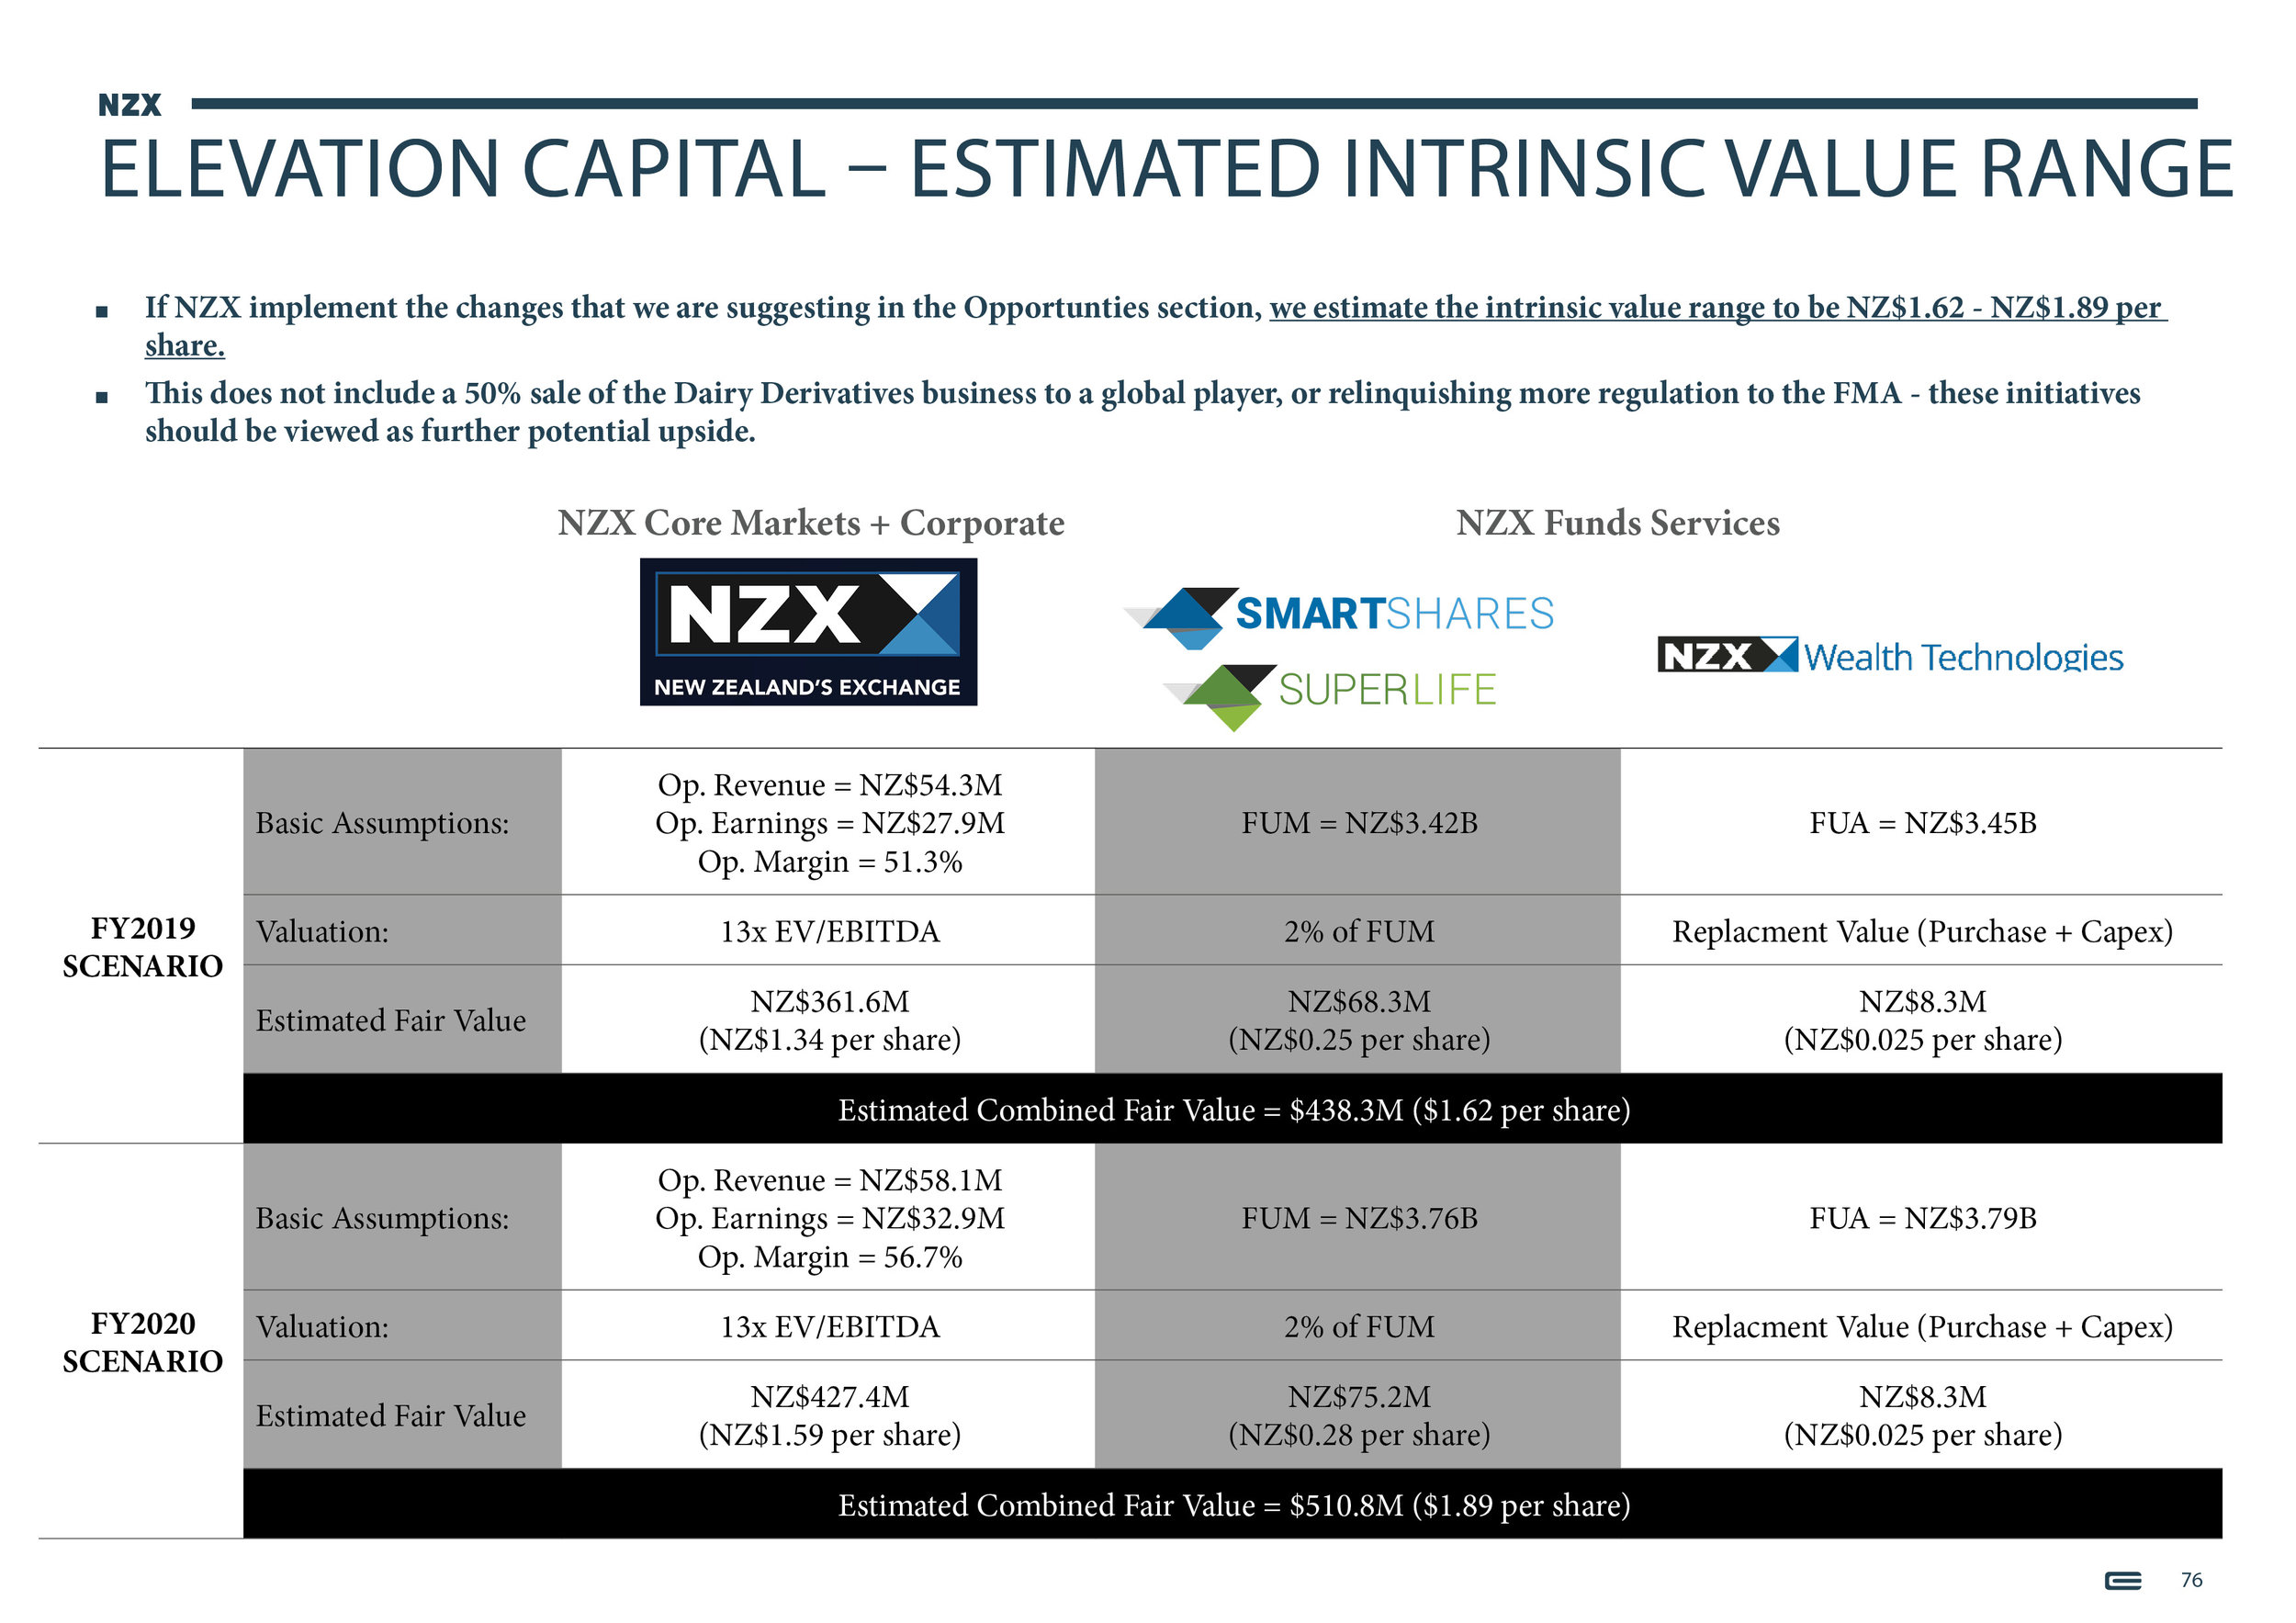 NZX Limited - Presentation - September 201876.jpg